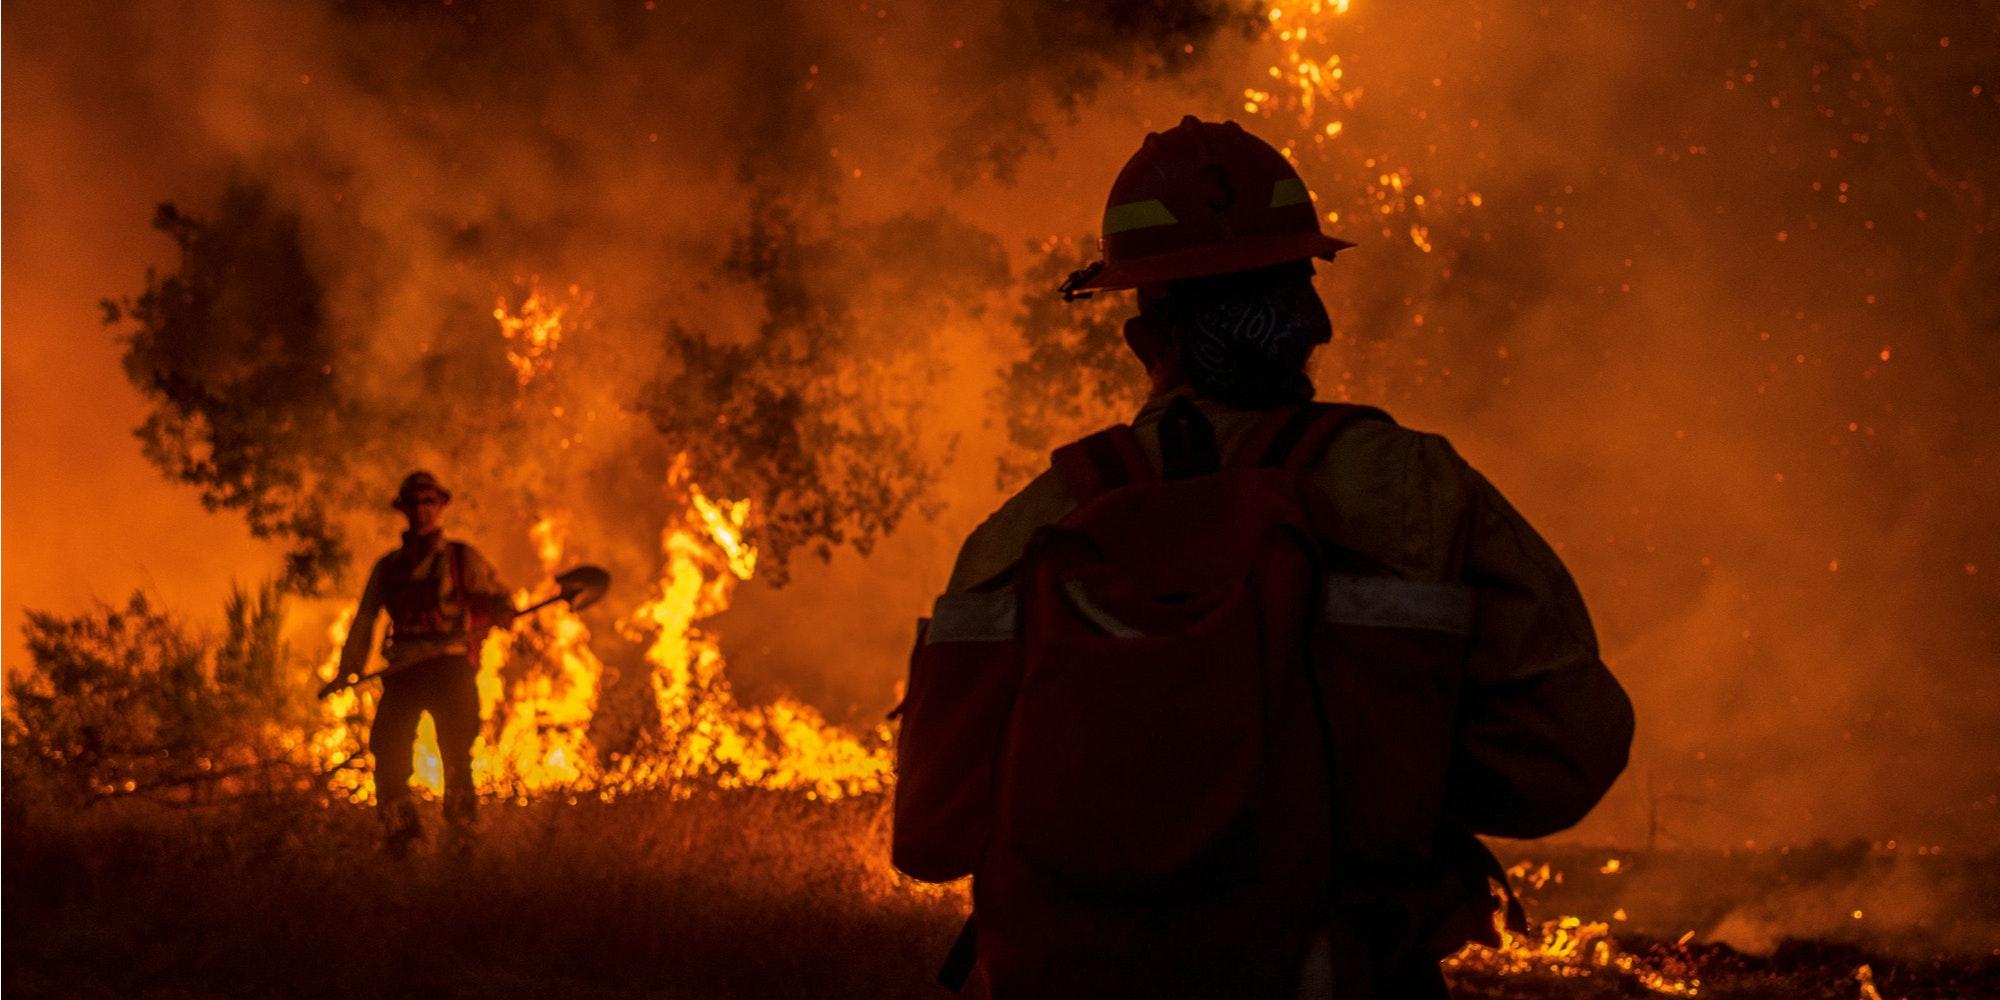 Bounchan Keola firefighter deport